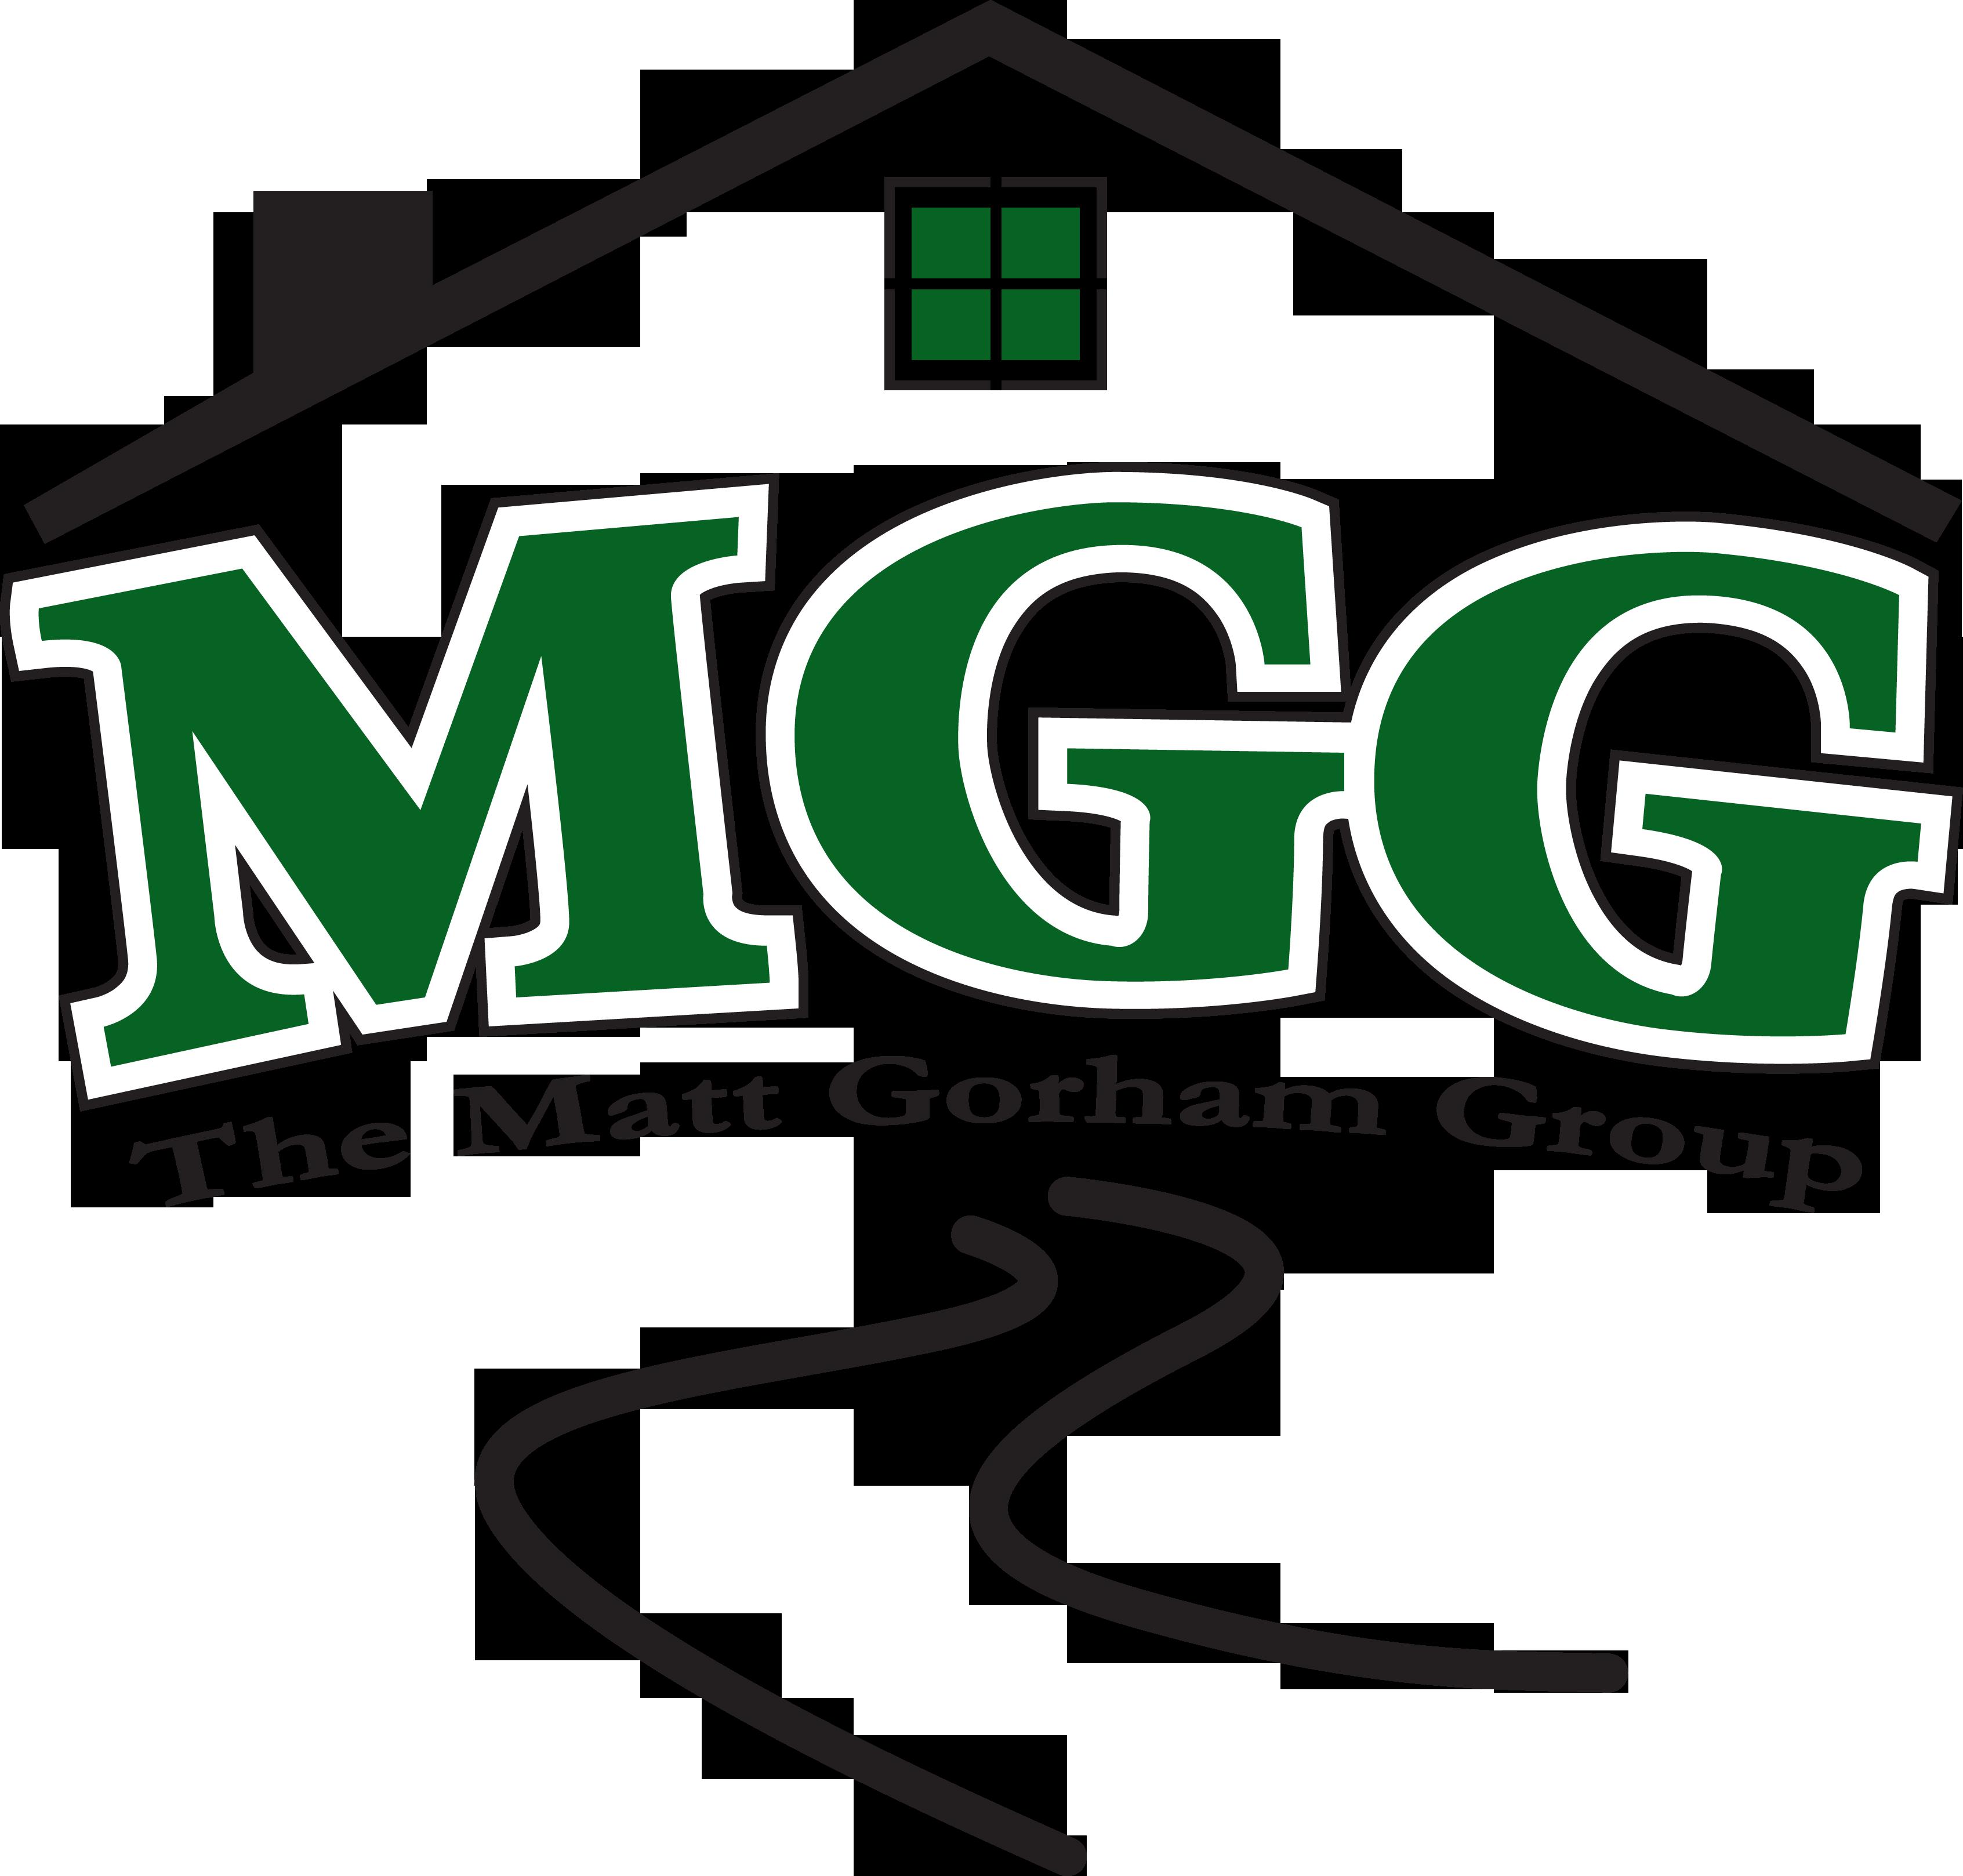 The Matt Gorham Group